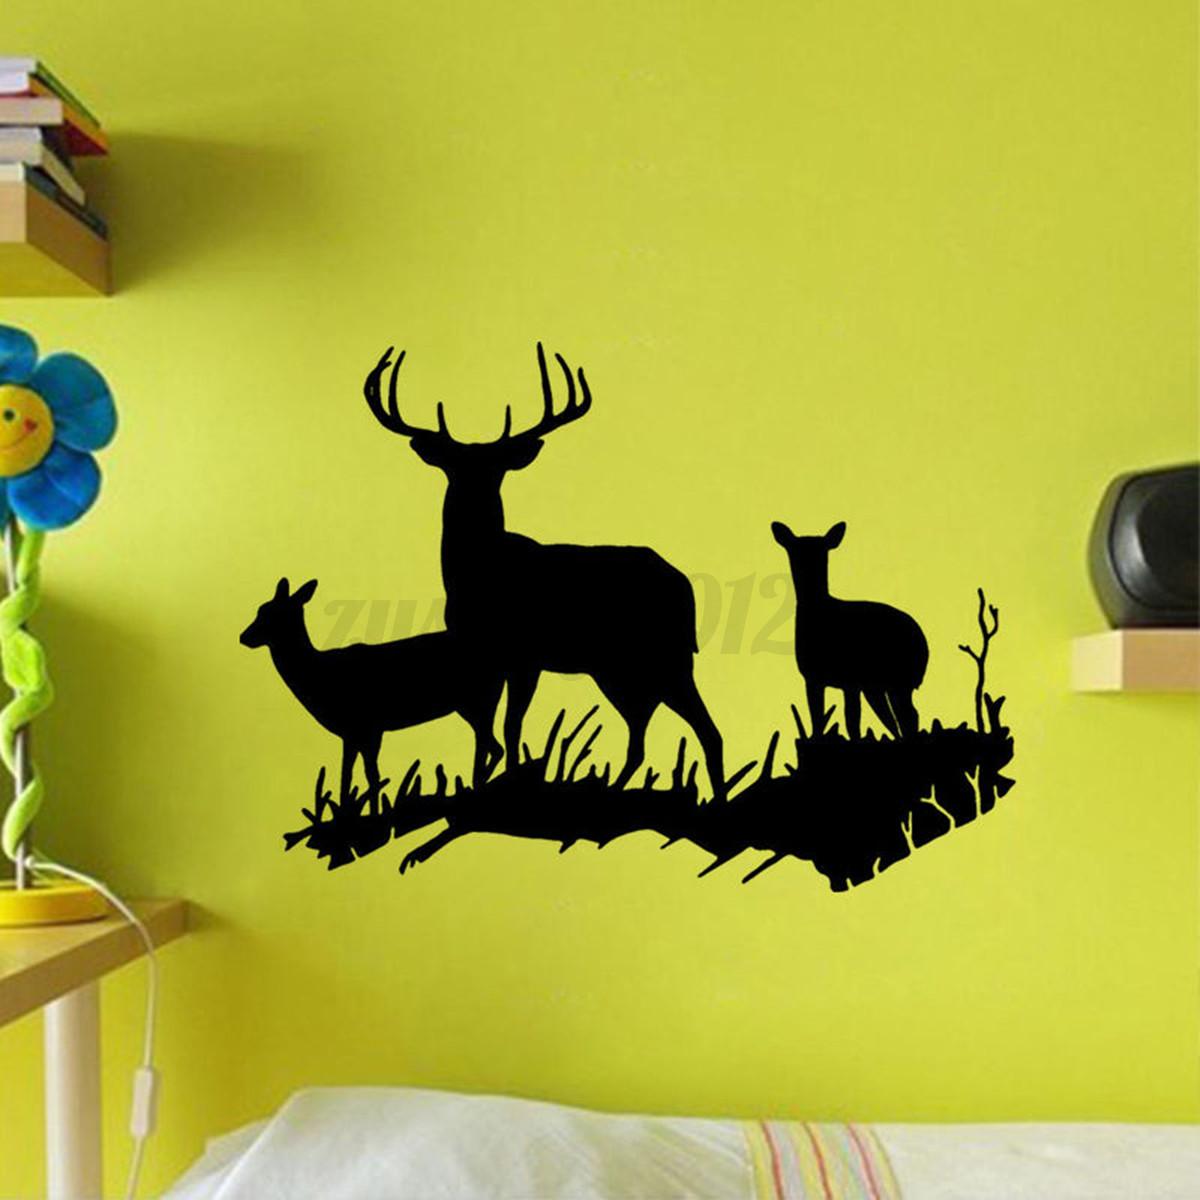 DIY Vinyl Quote Home Room Decor Art Wall Sticker Bedroom Removable ...